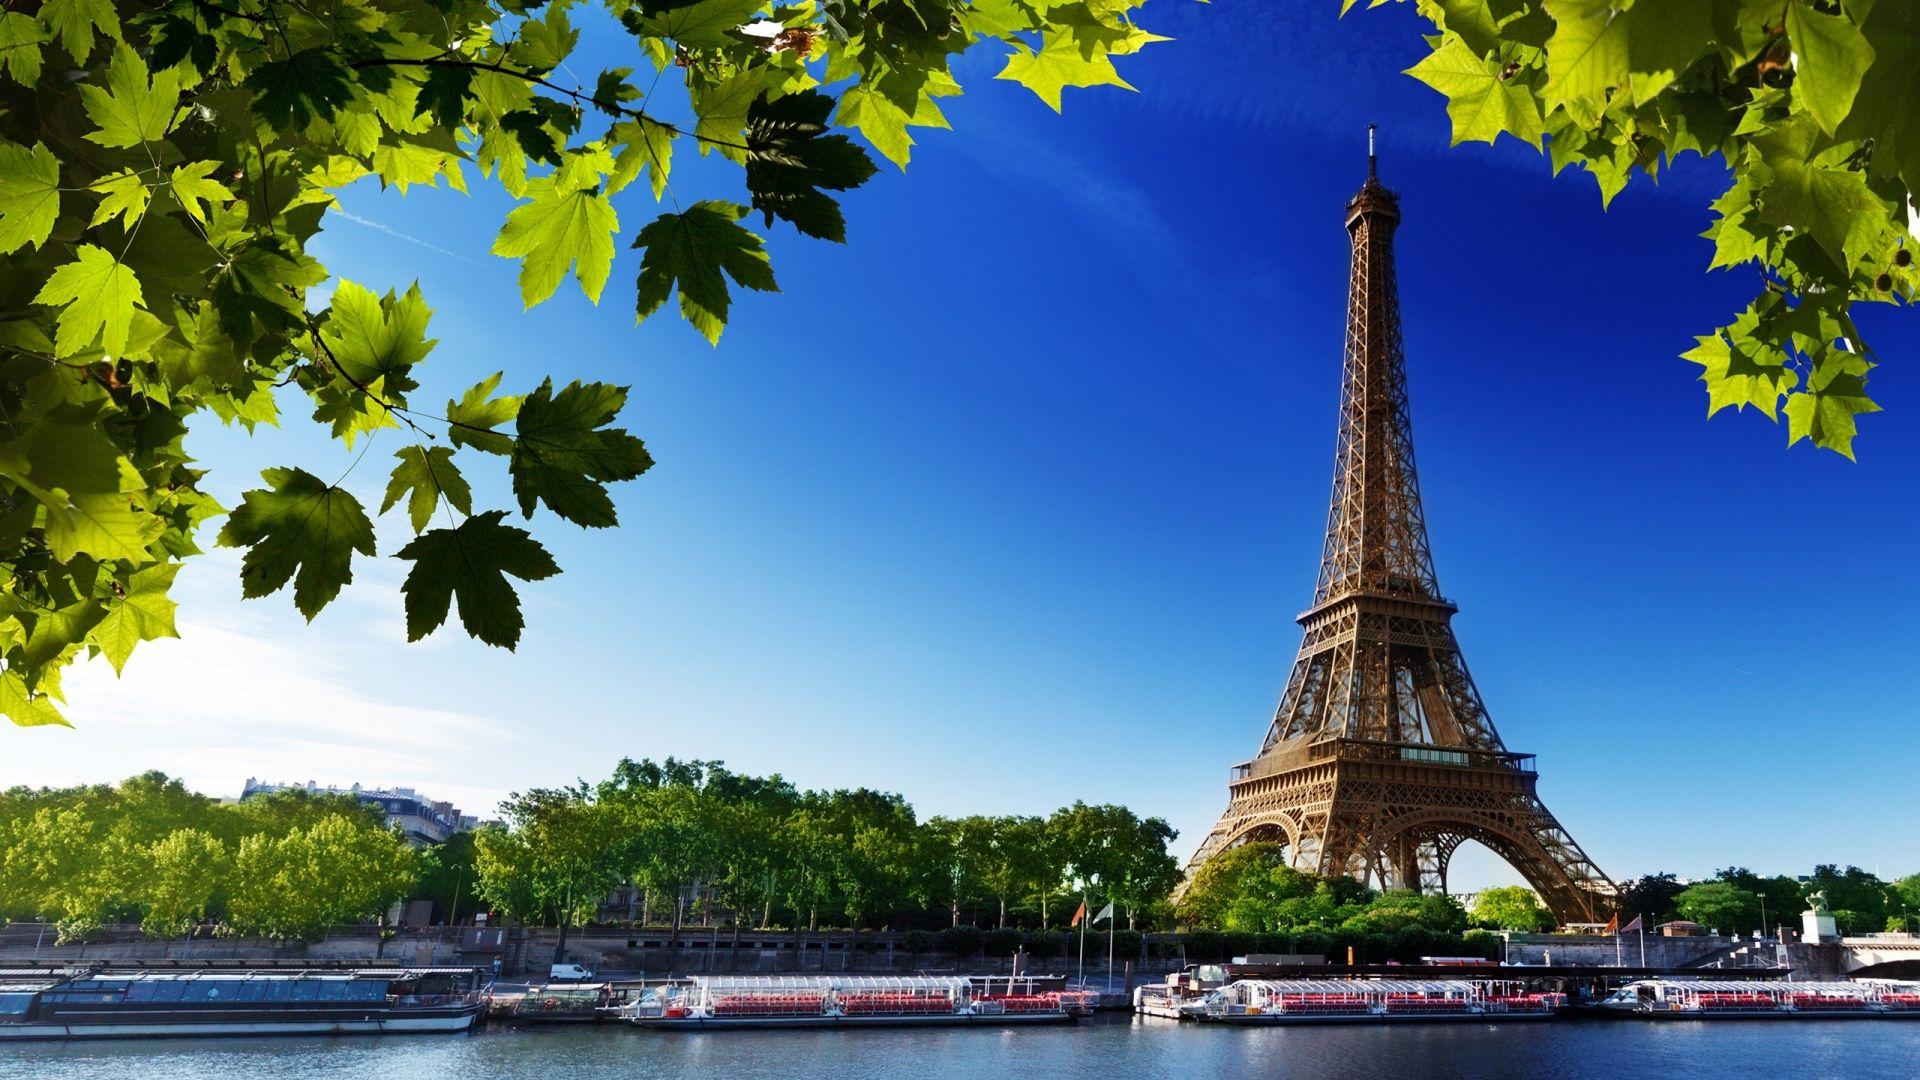 Download Wallpaper 1920x1080 Paris Eiffel Tower France